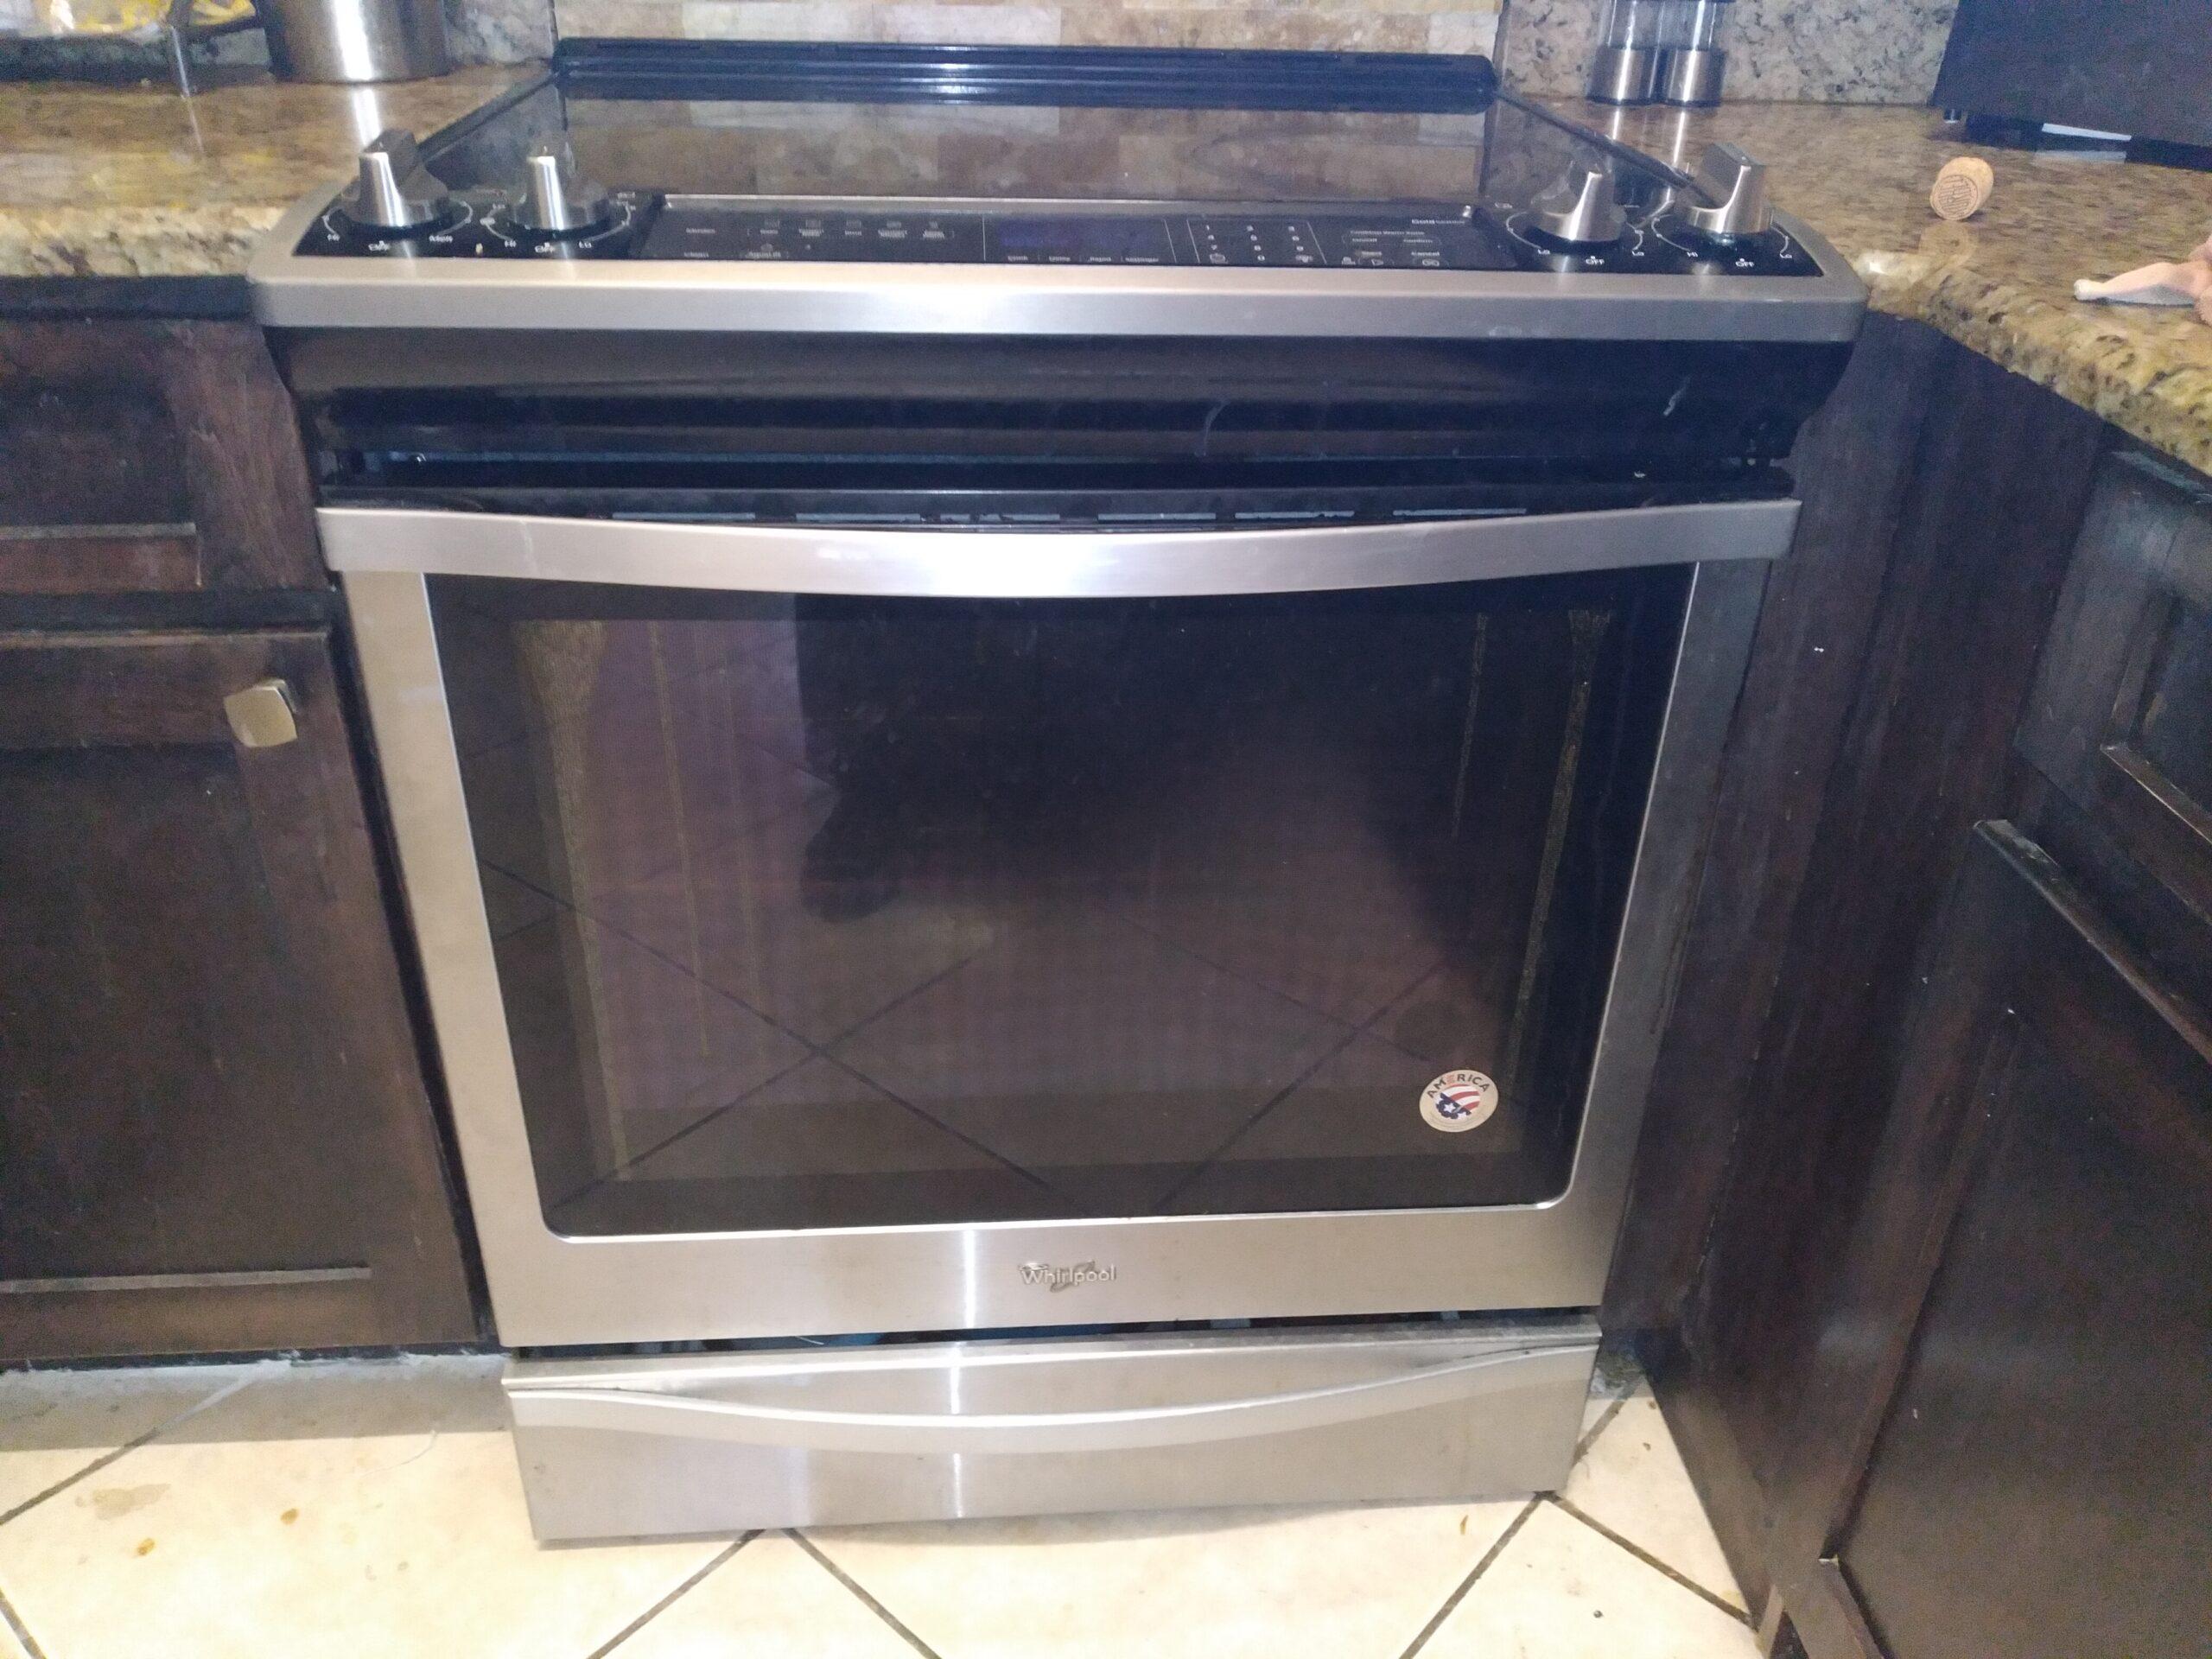 appliance repair stove top repair heating issue lake mary fl